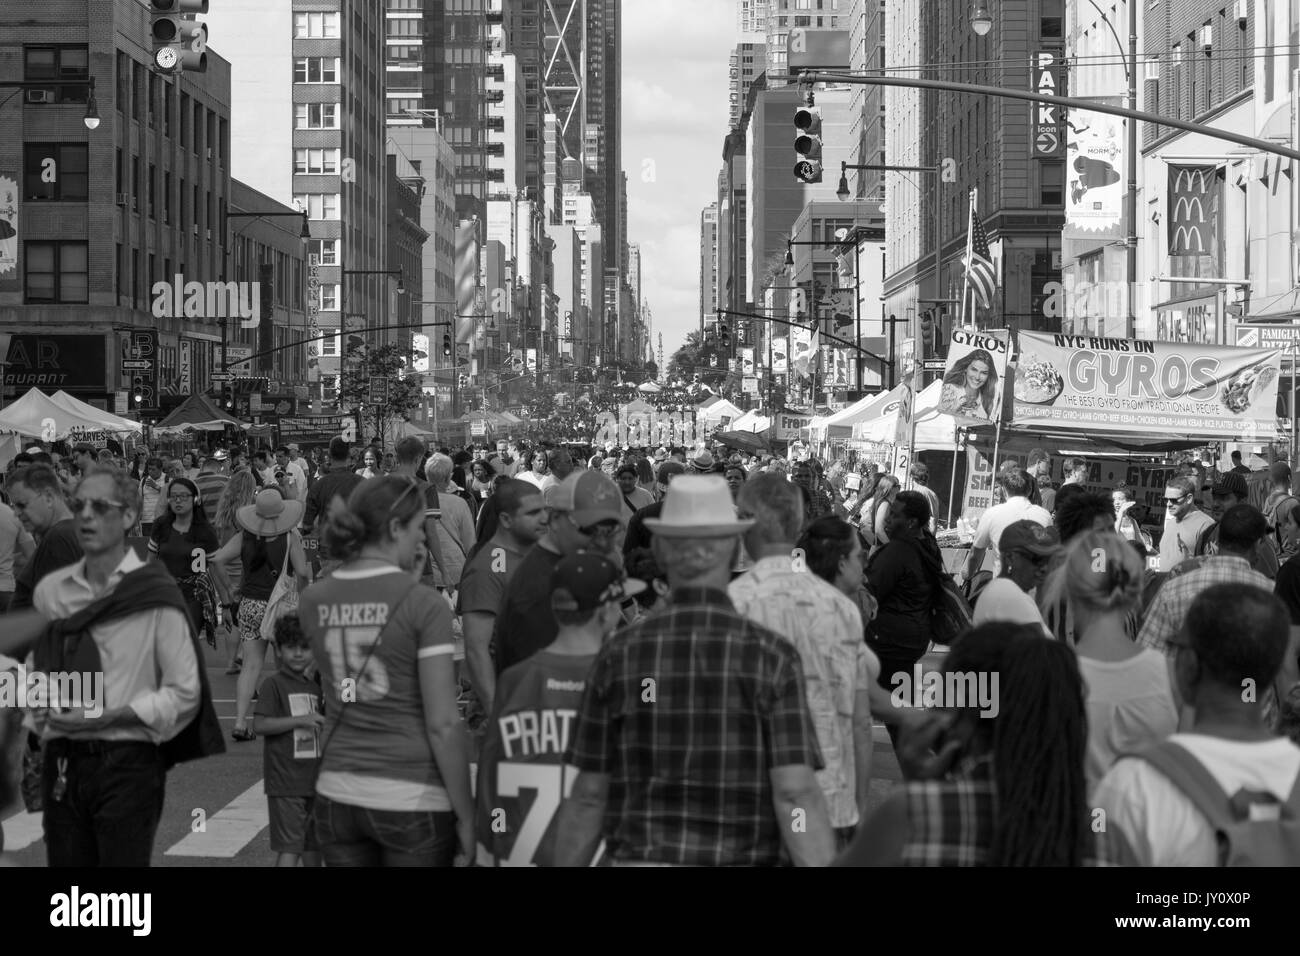 Busy New York City street market - Stock Image